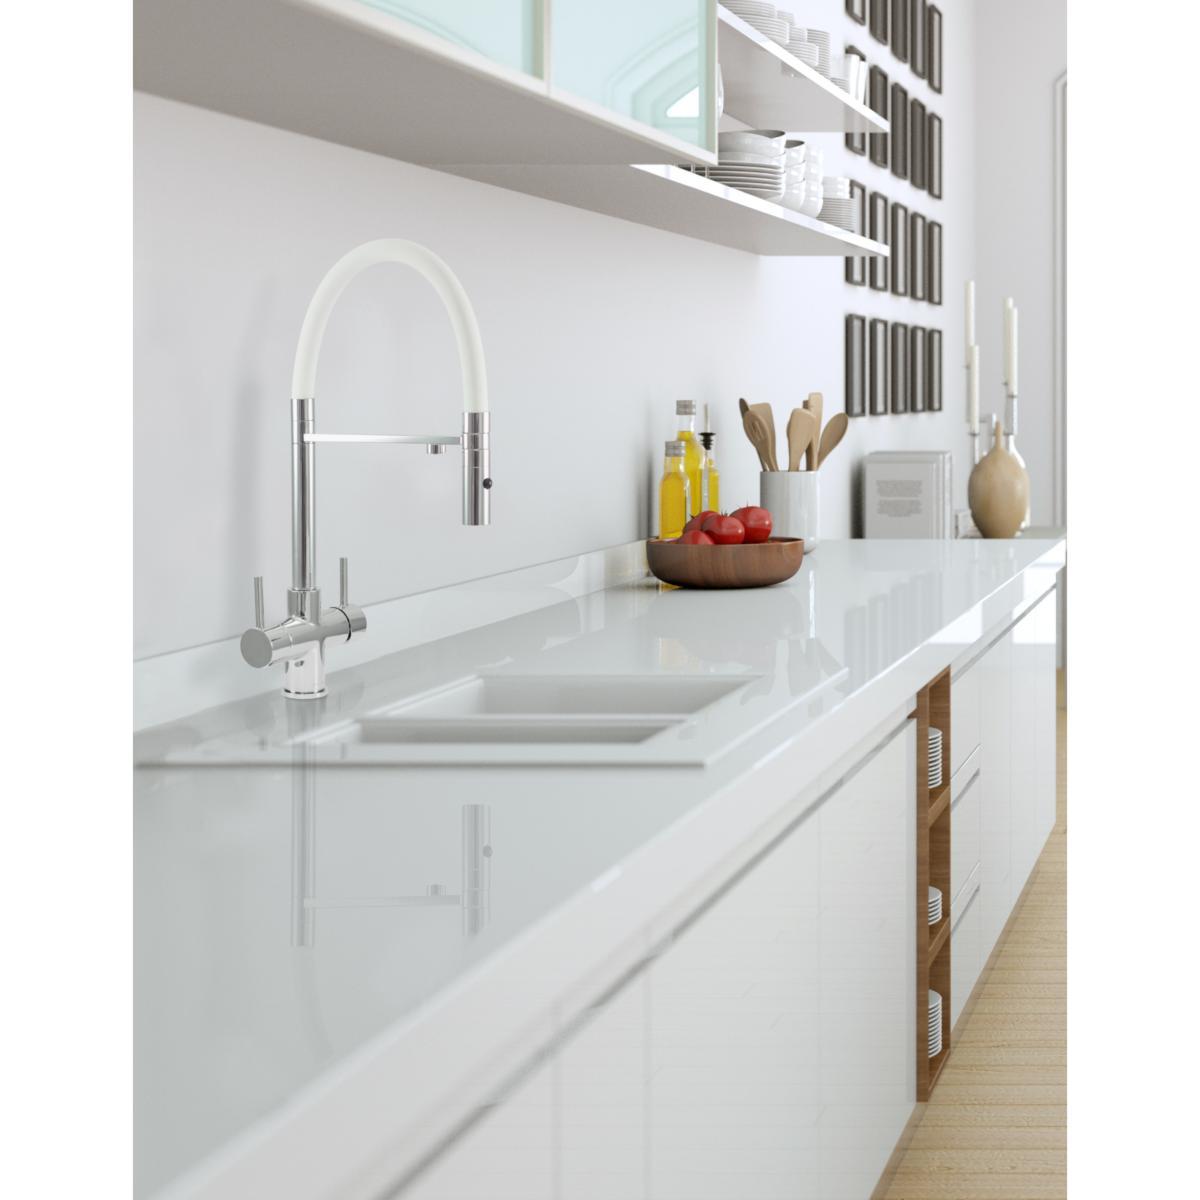 Acquapuro Aquila 3-Way 2 Lever Spray Kitchen Filter Tap White & Chrome